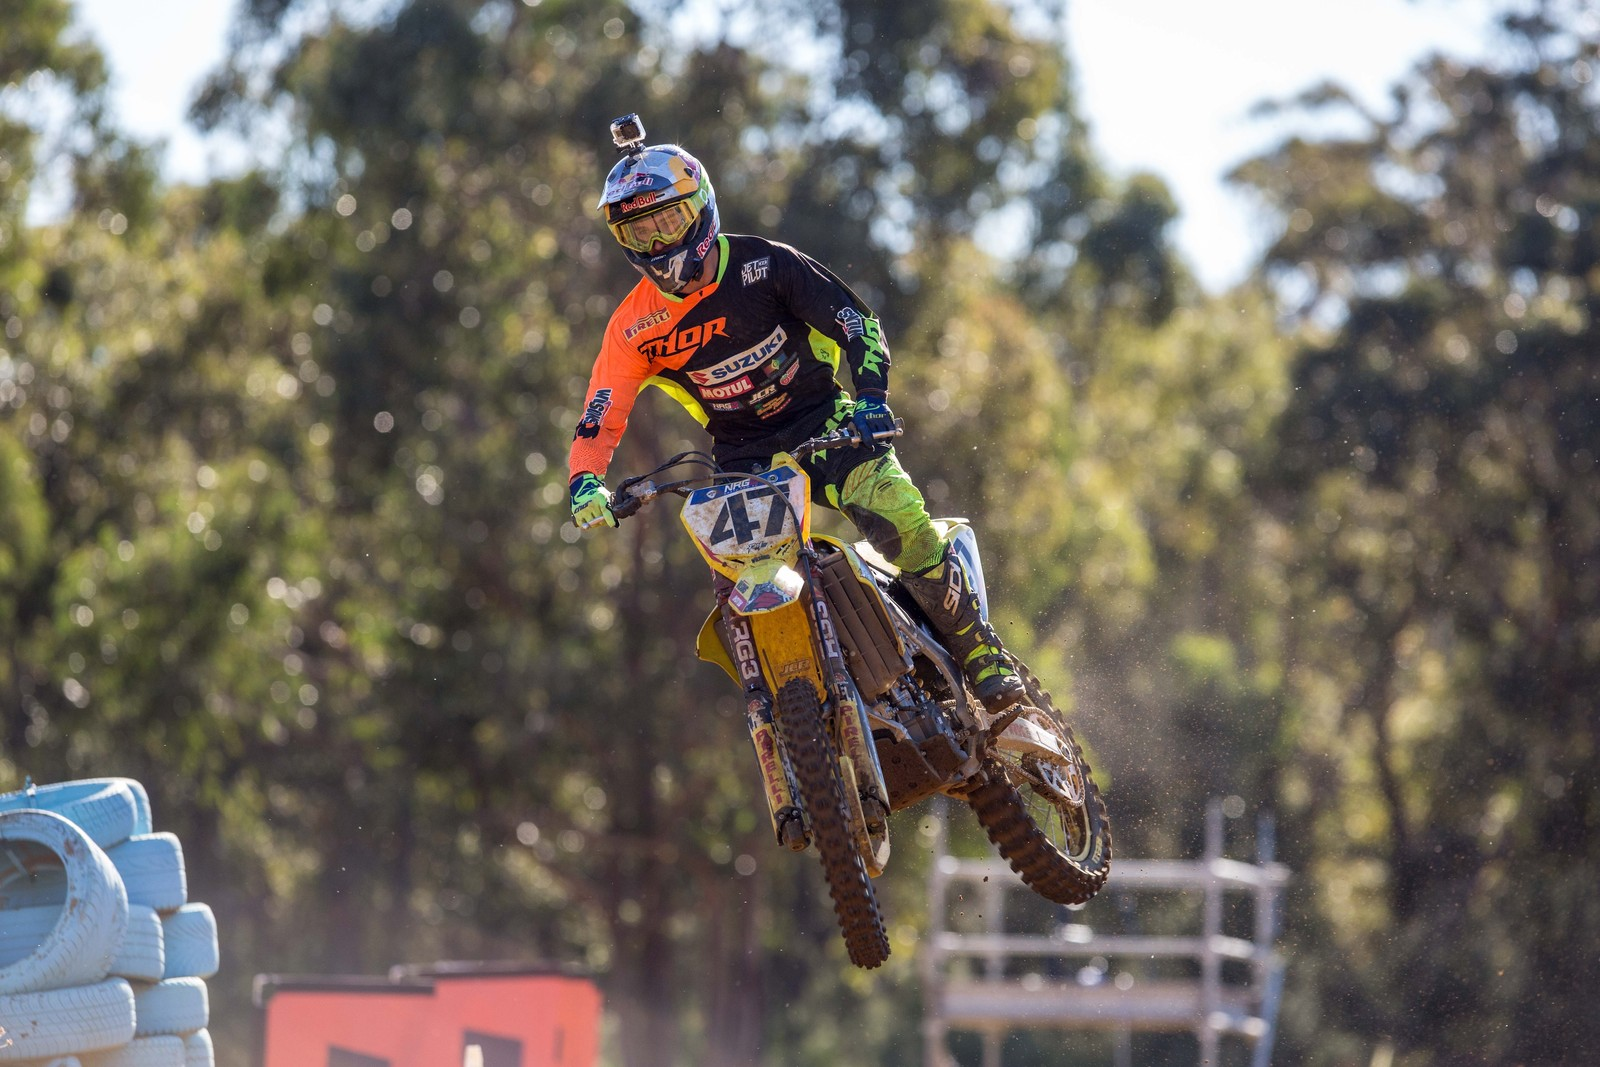 Todd Waters - Australian Motul MX Championships: Round 6, Nowra - Motocross Pictures - Vital MX